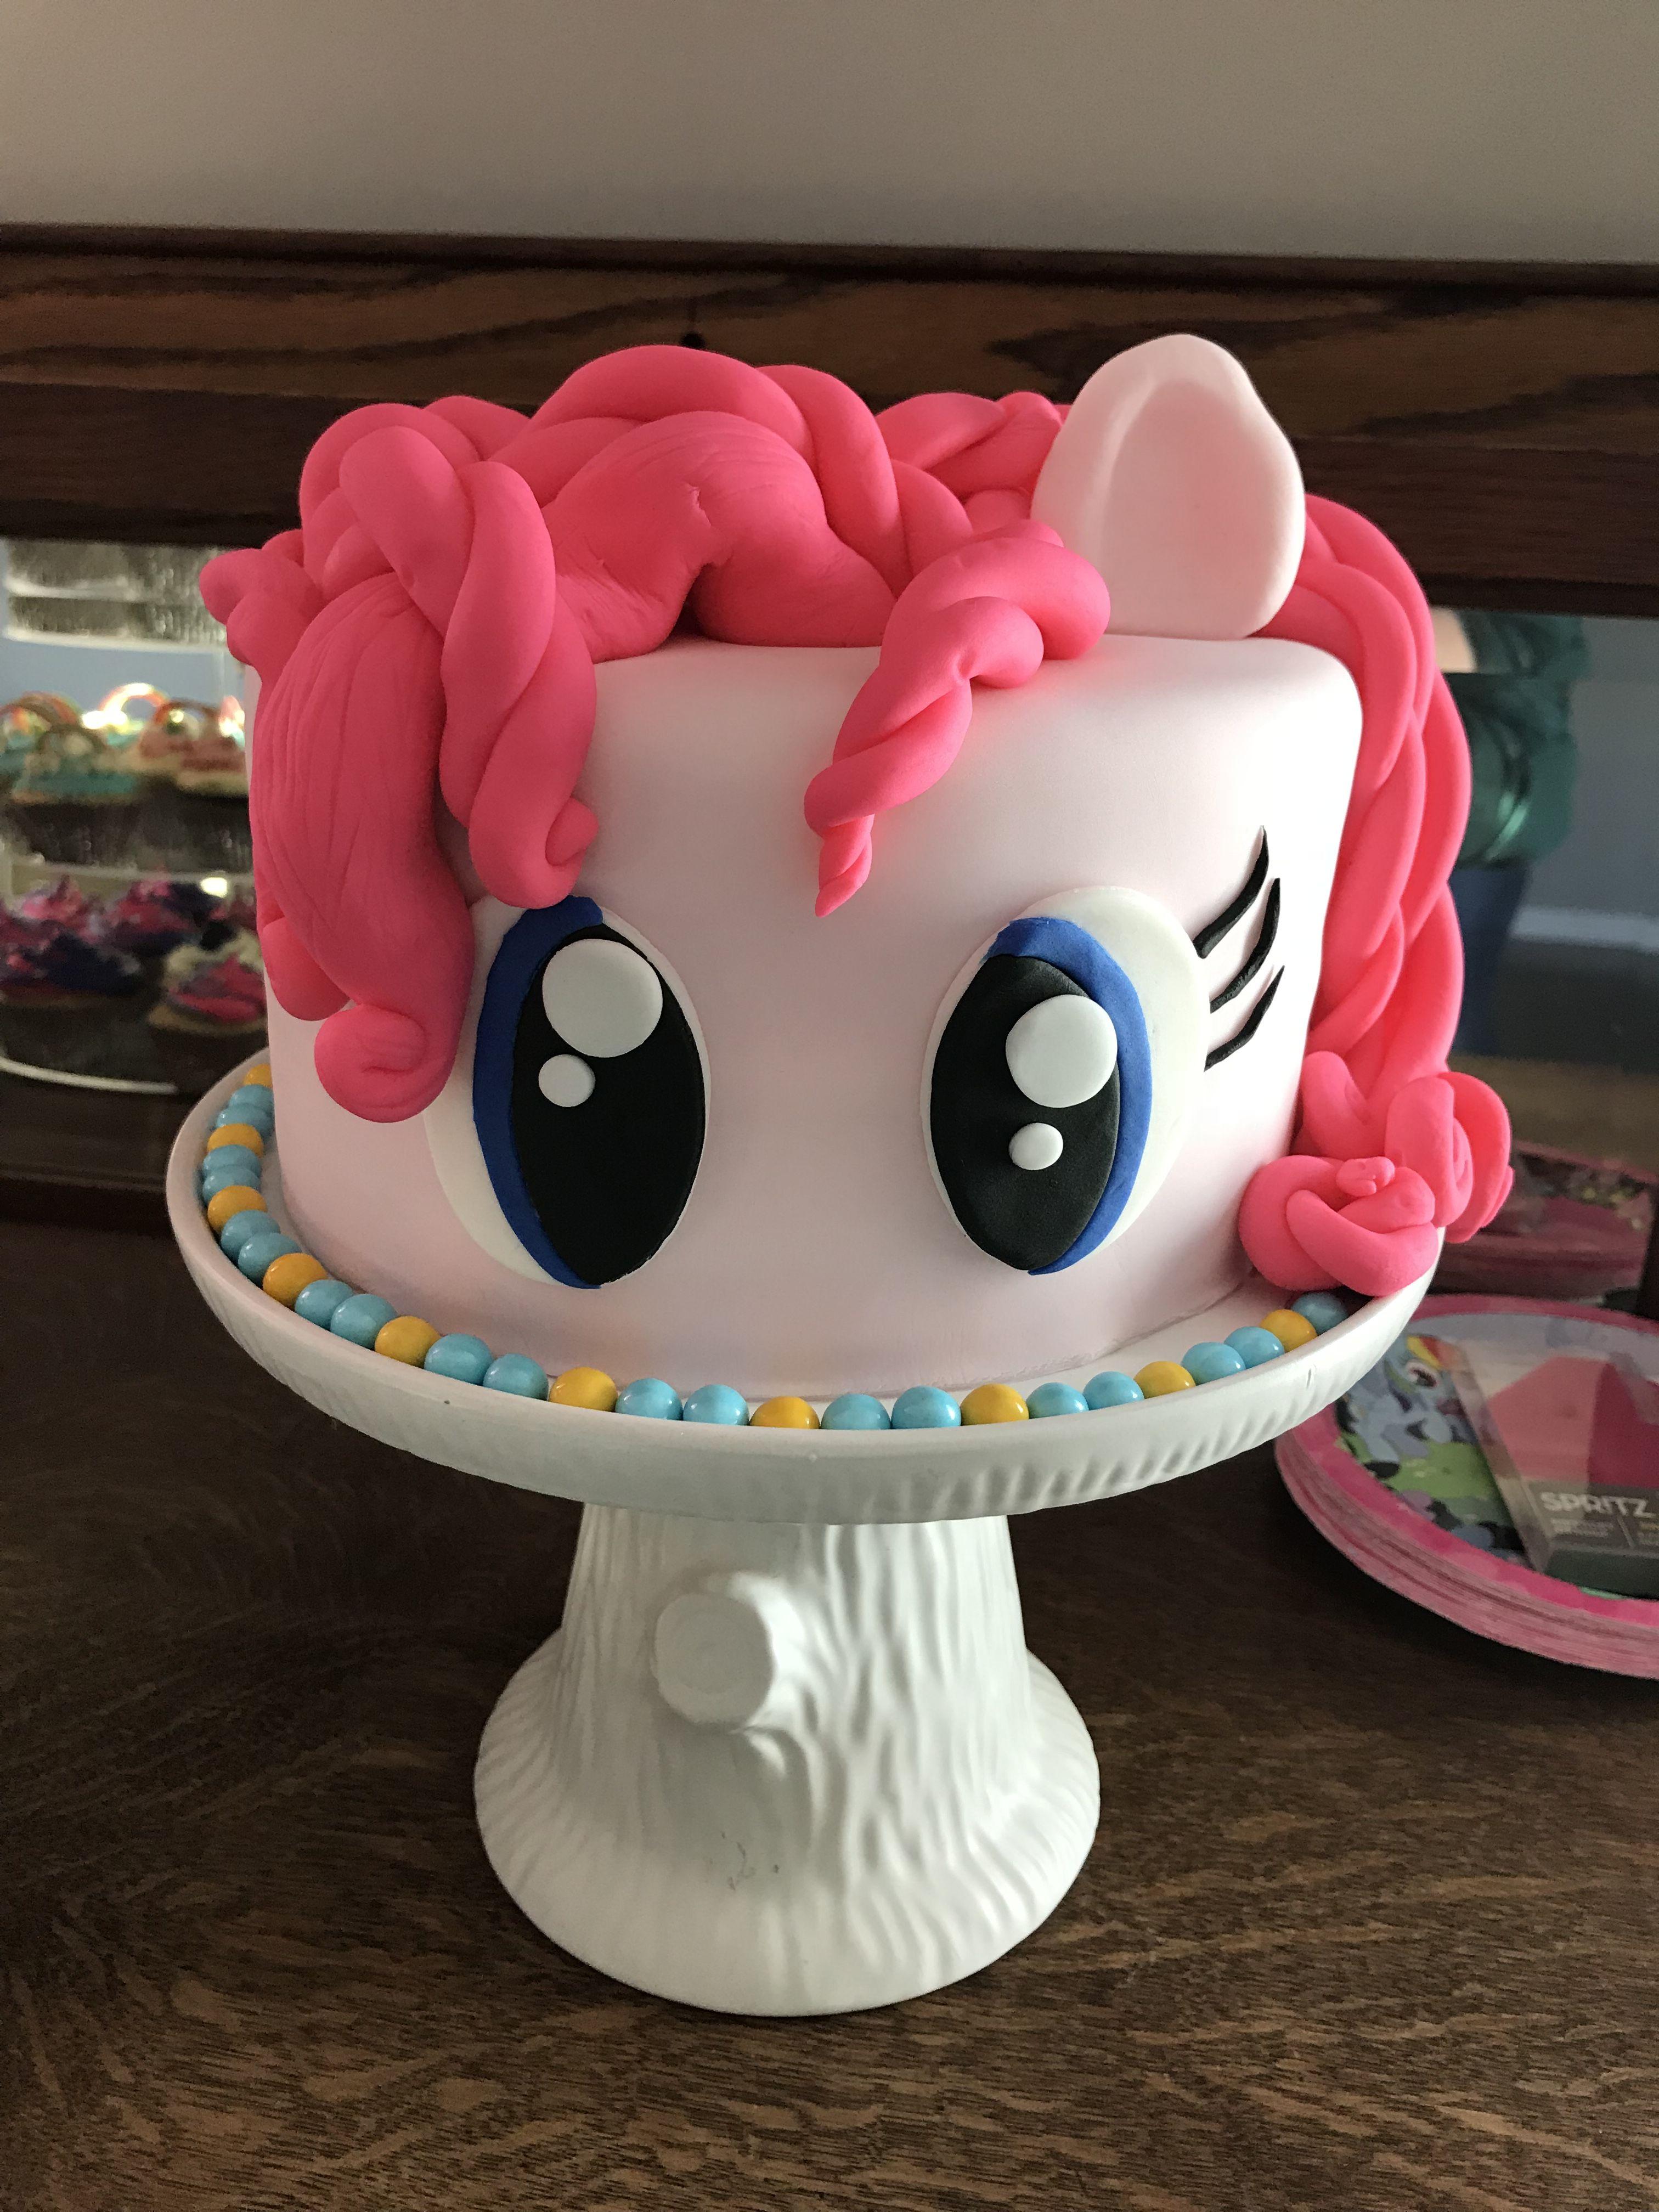 Pinkie Pie Cake That Liz And I Made For Avens My Little Pony Party Mylittleponycake Mylittleponyparty Mylittleponycupcake Pinkiepie Pinkiepiecake